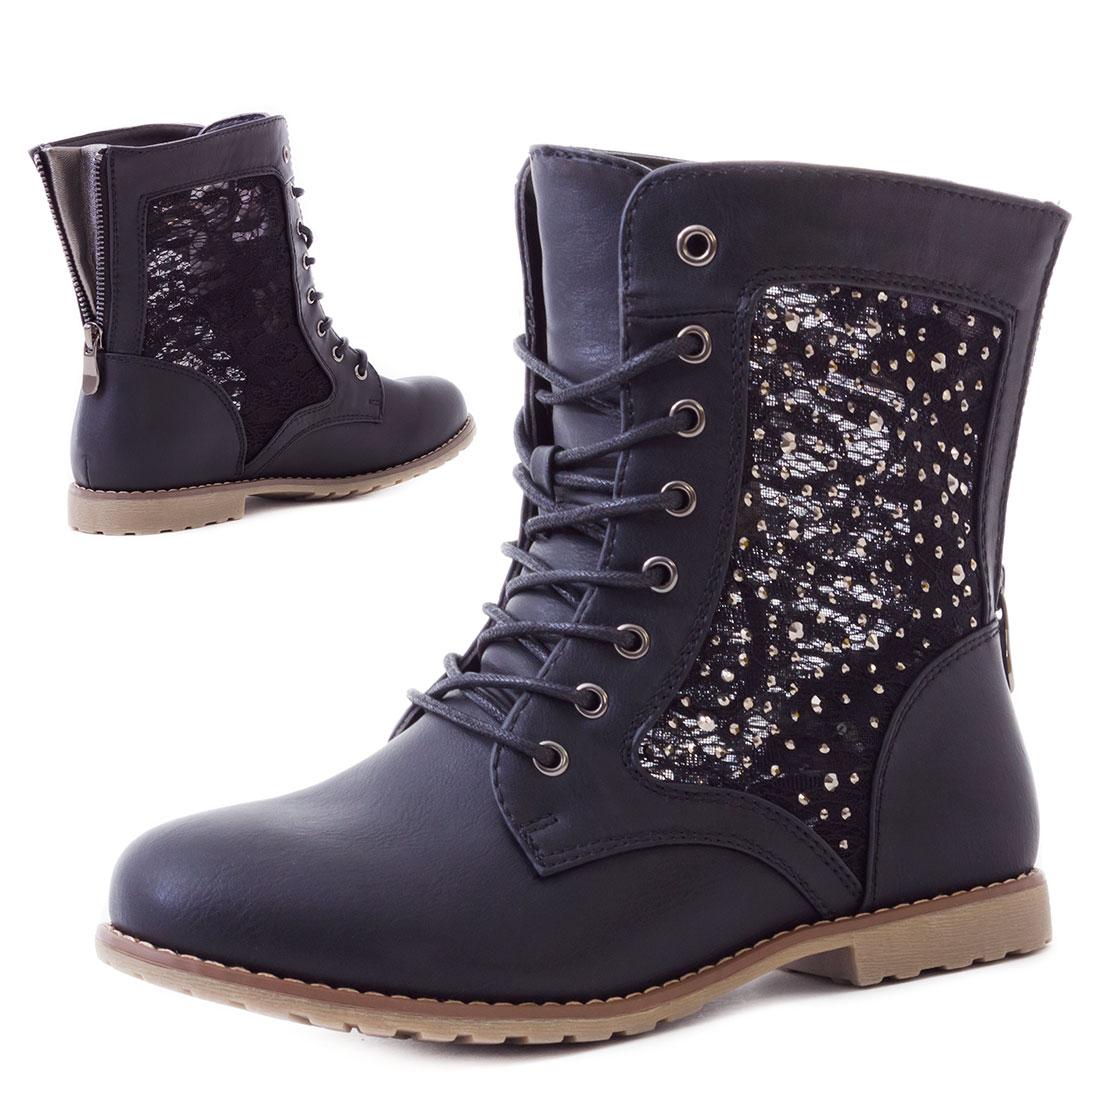 damen schuhe spitze strass boots stiefel stiefeletten gr e 37 38 39 40 41 42 43 ebay. Black Bedroom Furniture Sets. Home Design Ideas